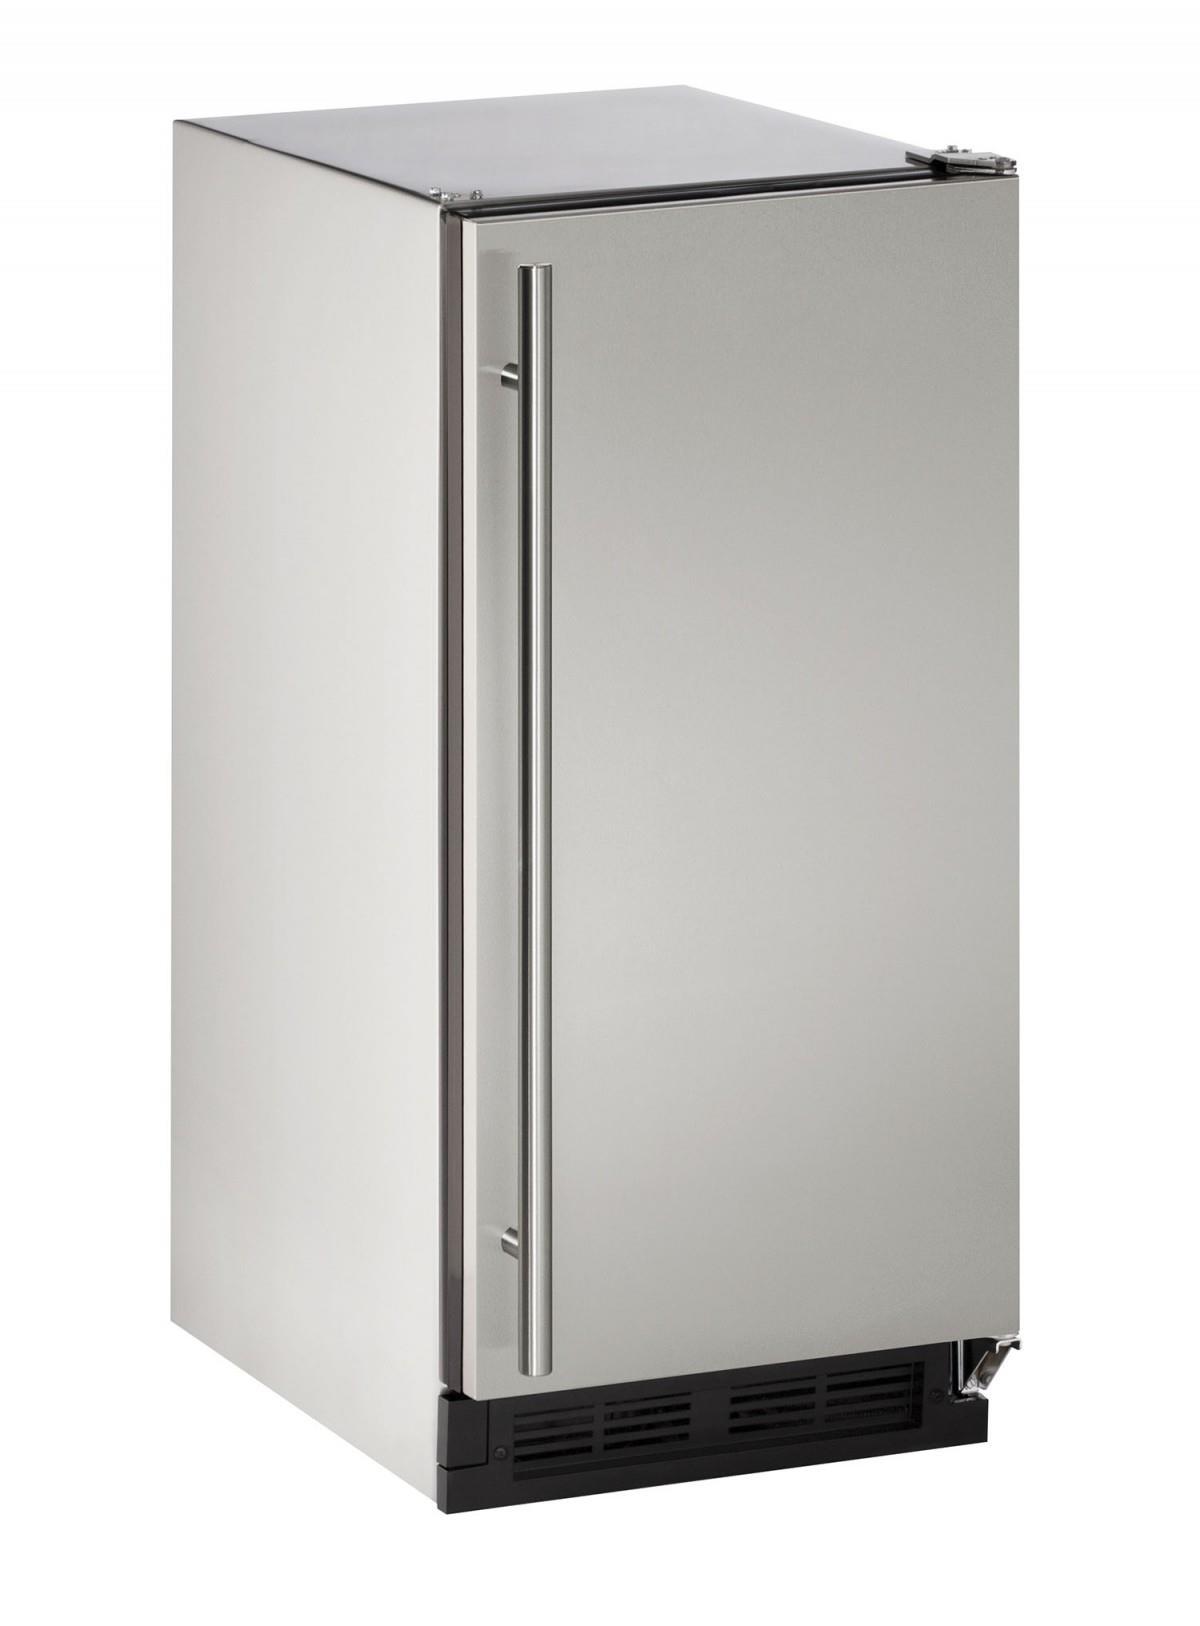 "U-Line Ice Maker 15"" Outdoor Clear Cube Ice Maker - Item Number: U-CLR1215SOD-40A"